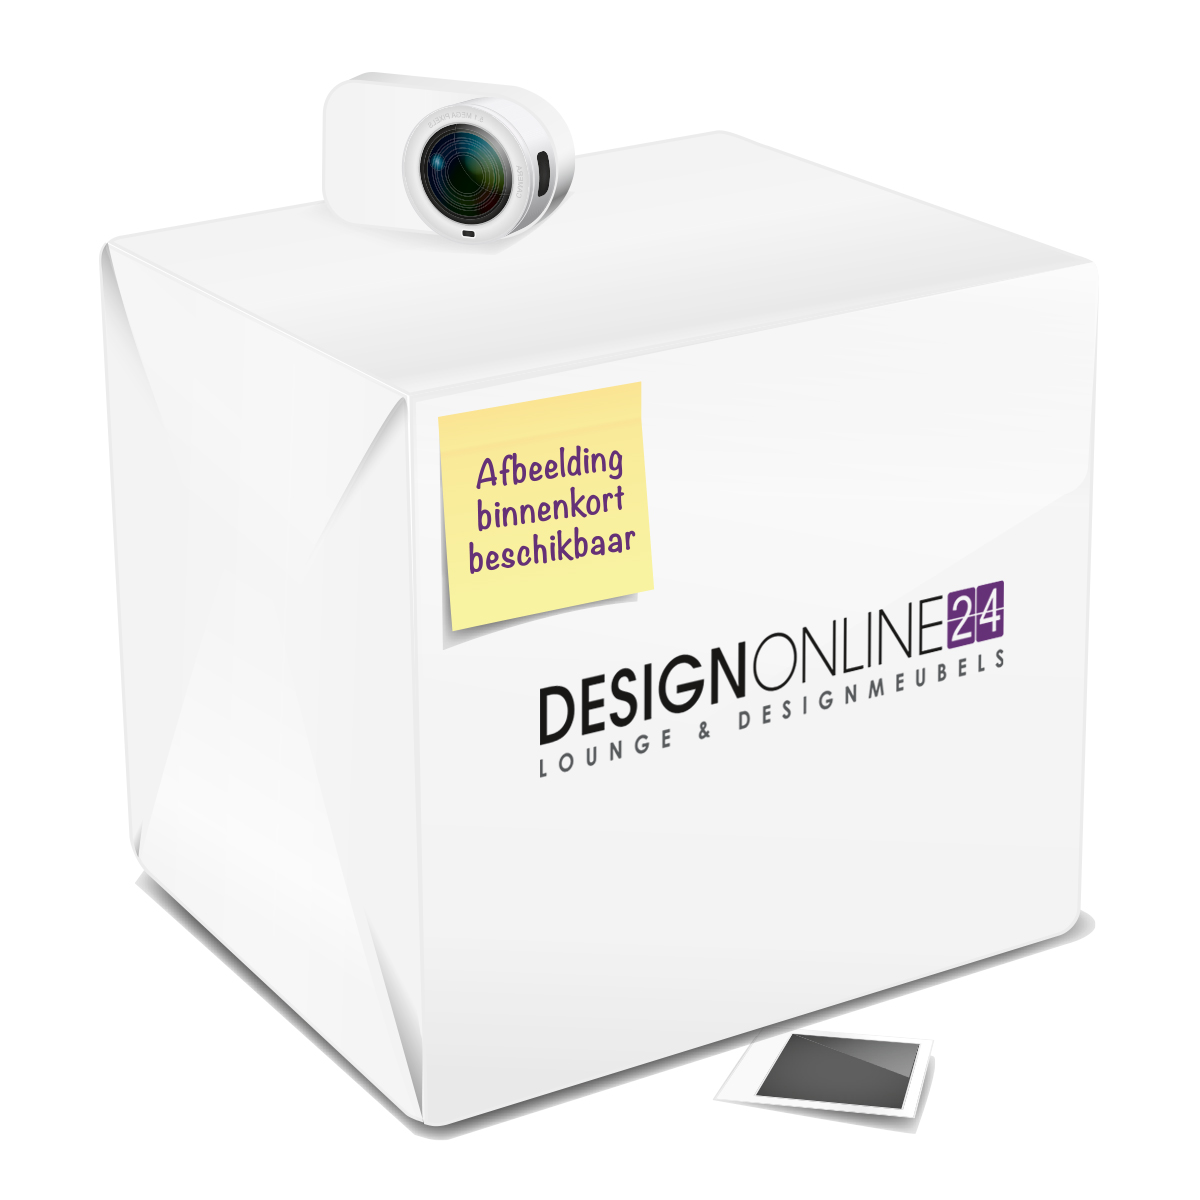 24Designs 24Designs Barkruk Maxime - Zithoogte 77 cm - Chromen onderstel - Kunstleren zitting - Paars